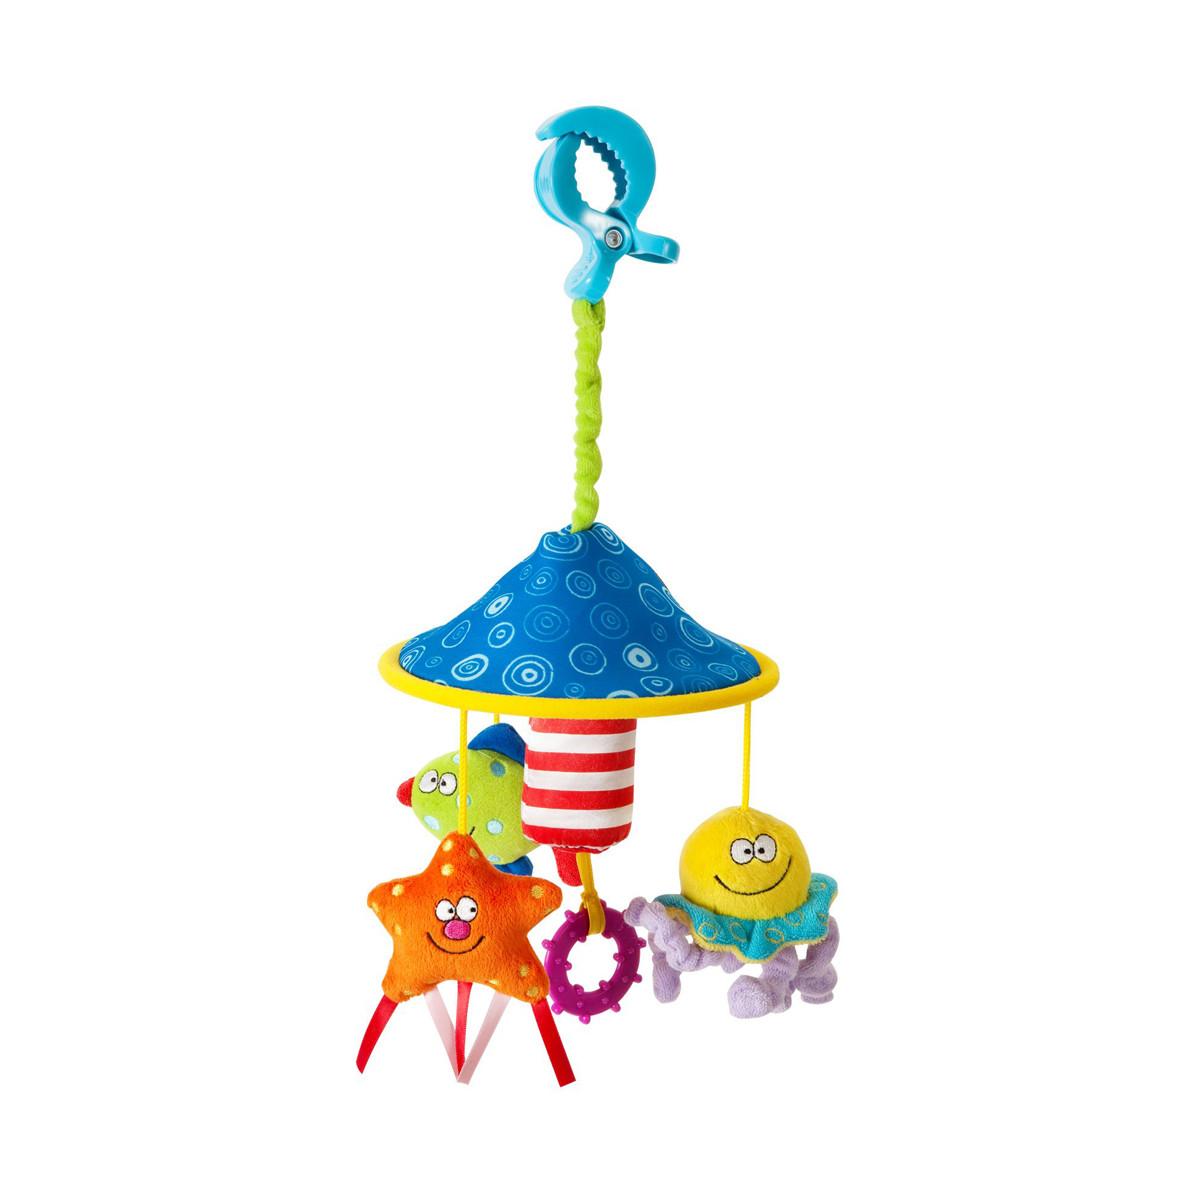 Міні-мобіль «Taf Toys» (11125) Океан